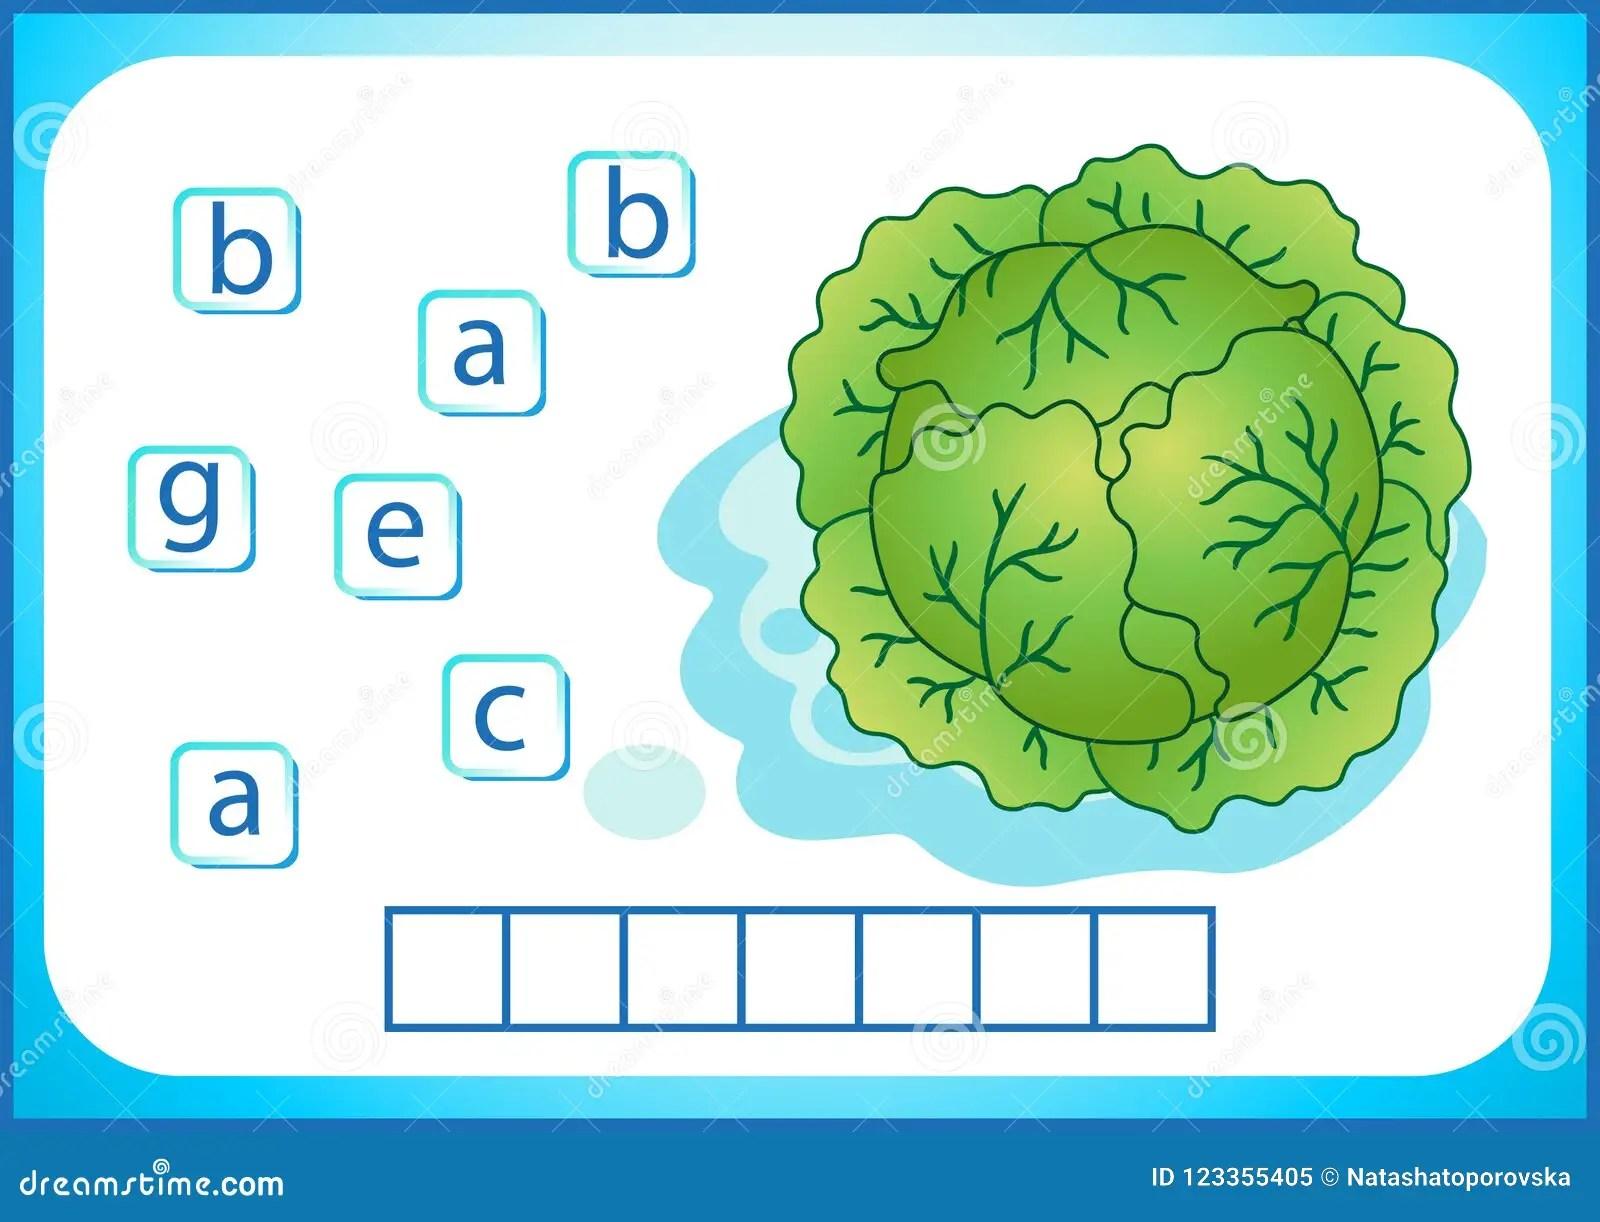 Educacion Escolar Flashcard Ingles Para Aprender Ingles